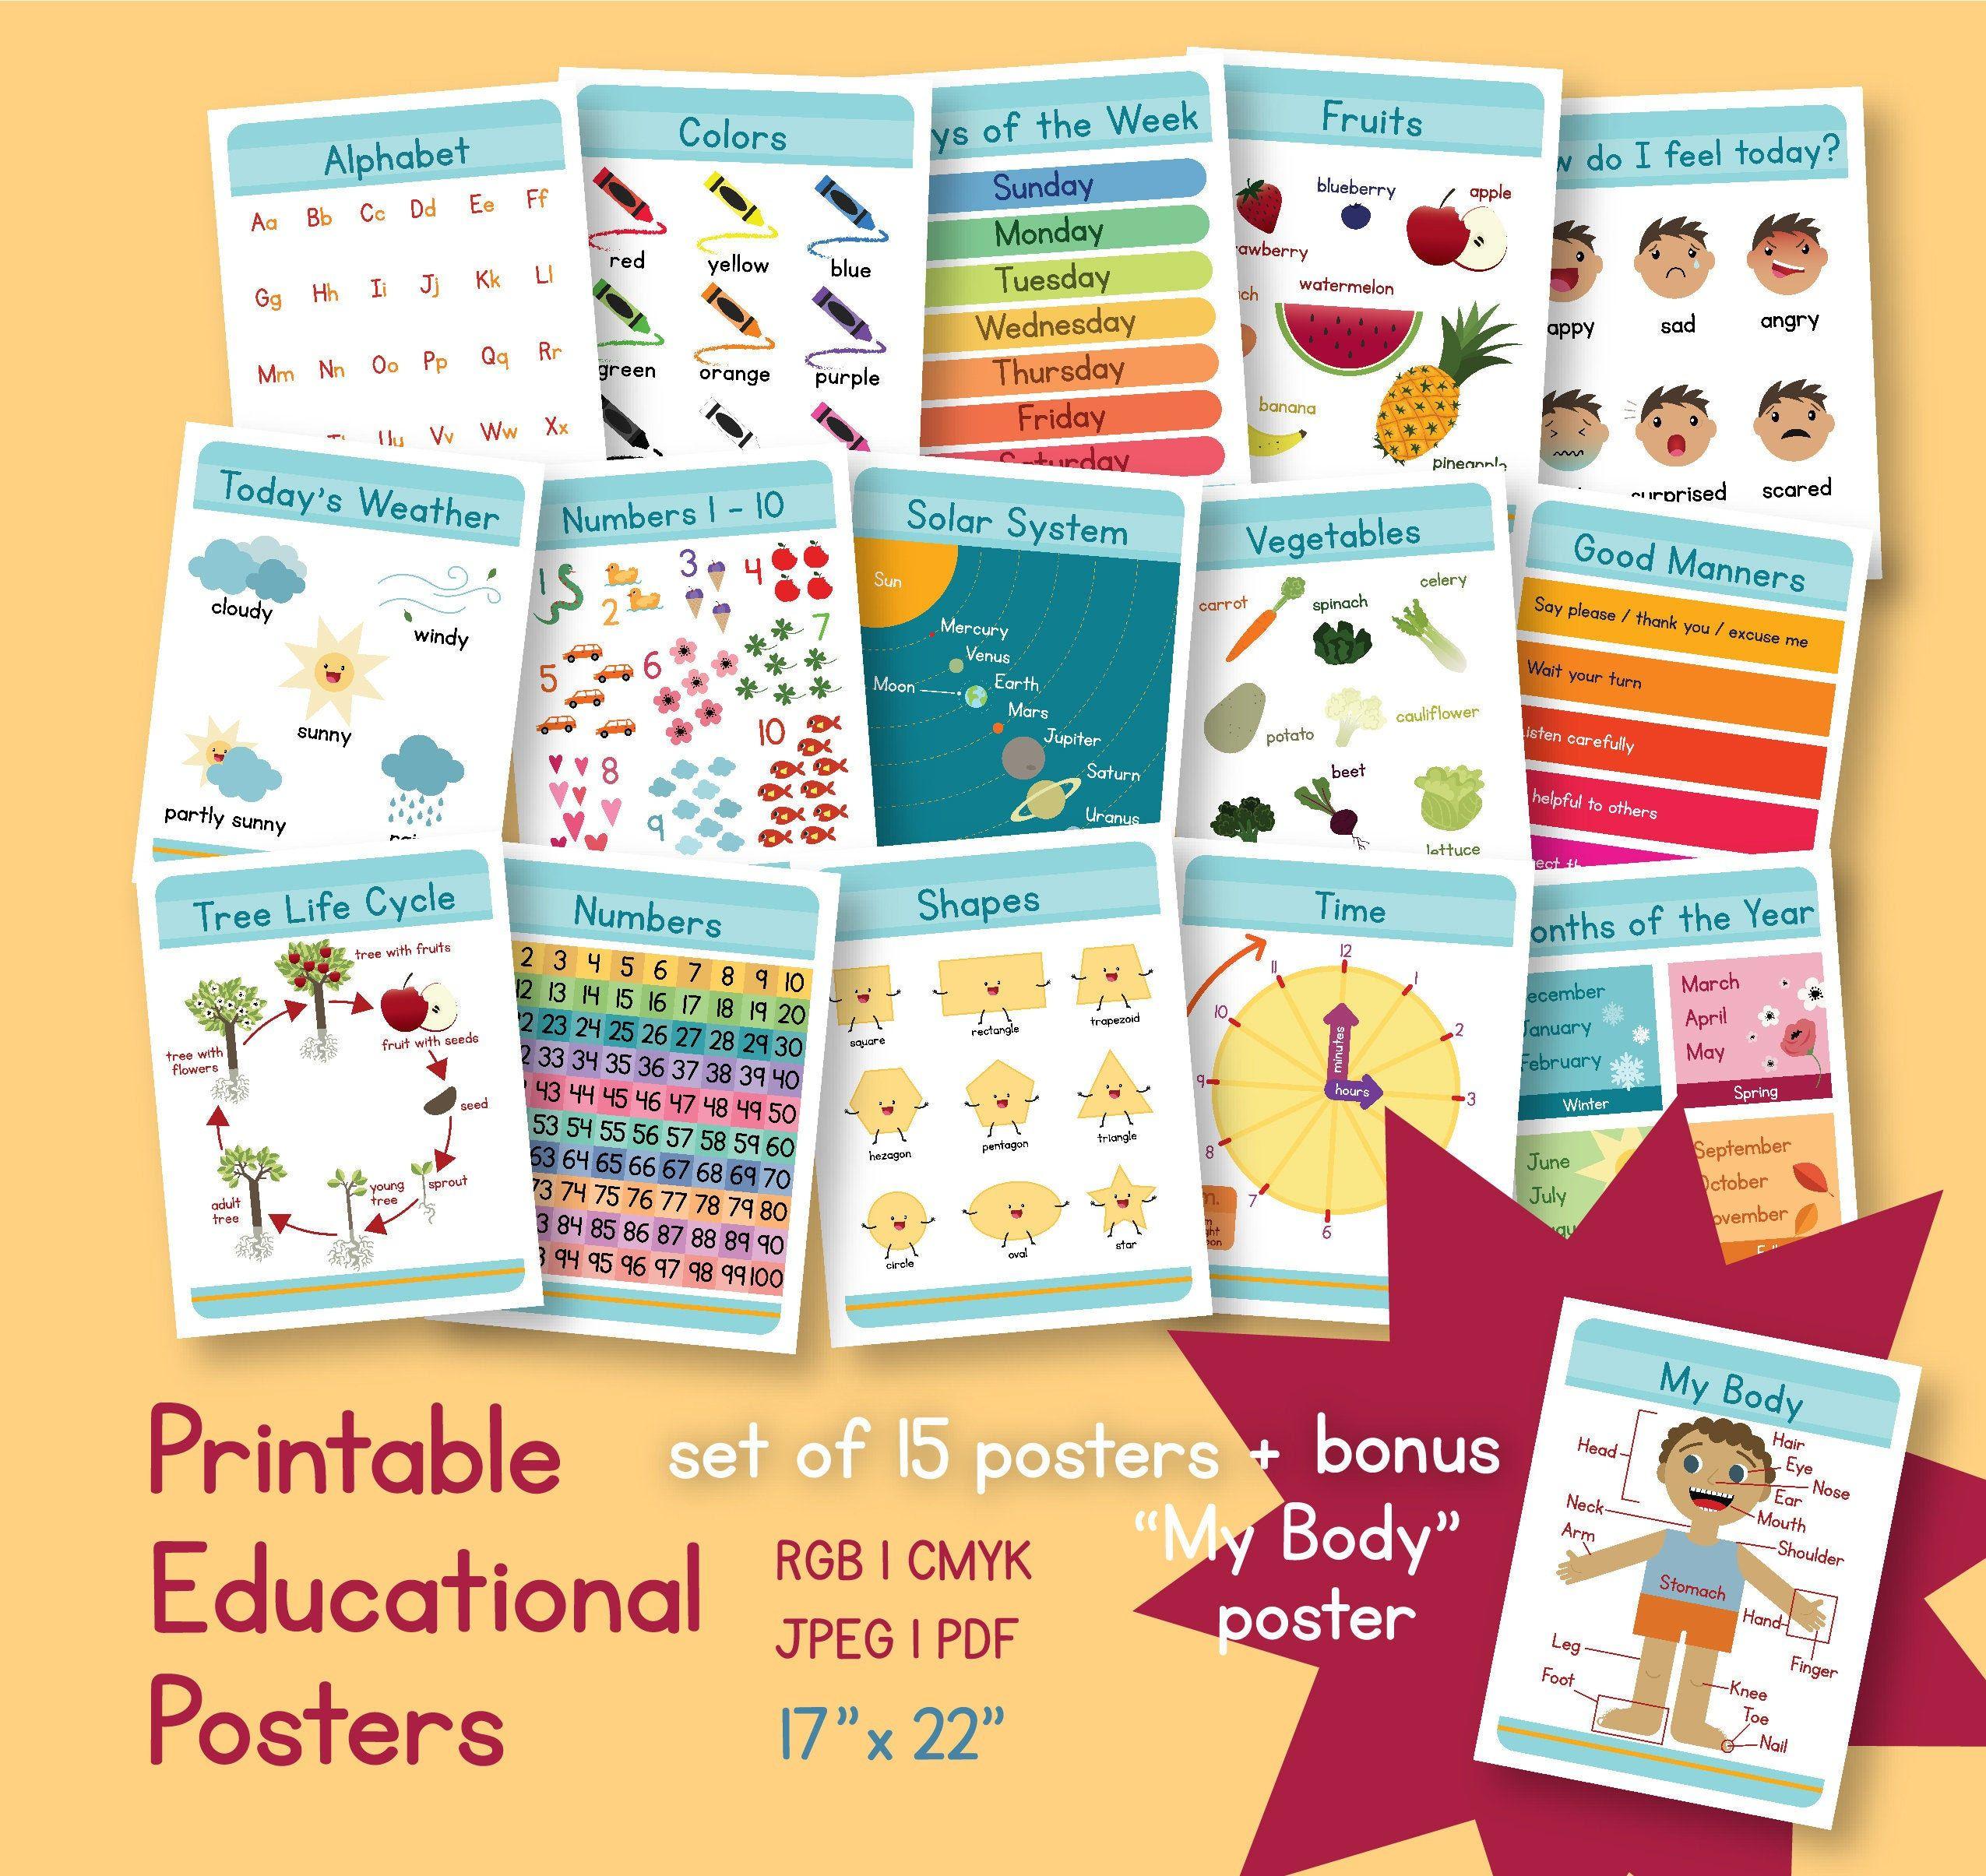 Printable Educational Posters For Toddlers Preschoolers